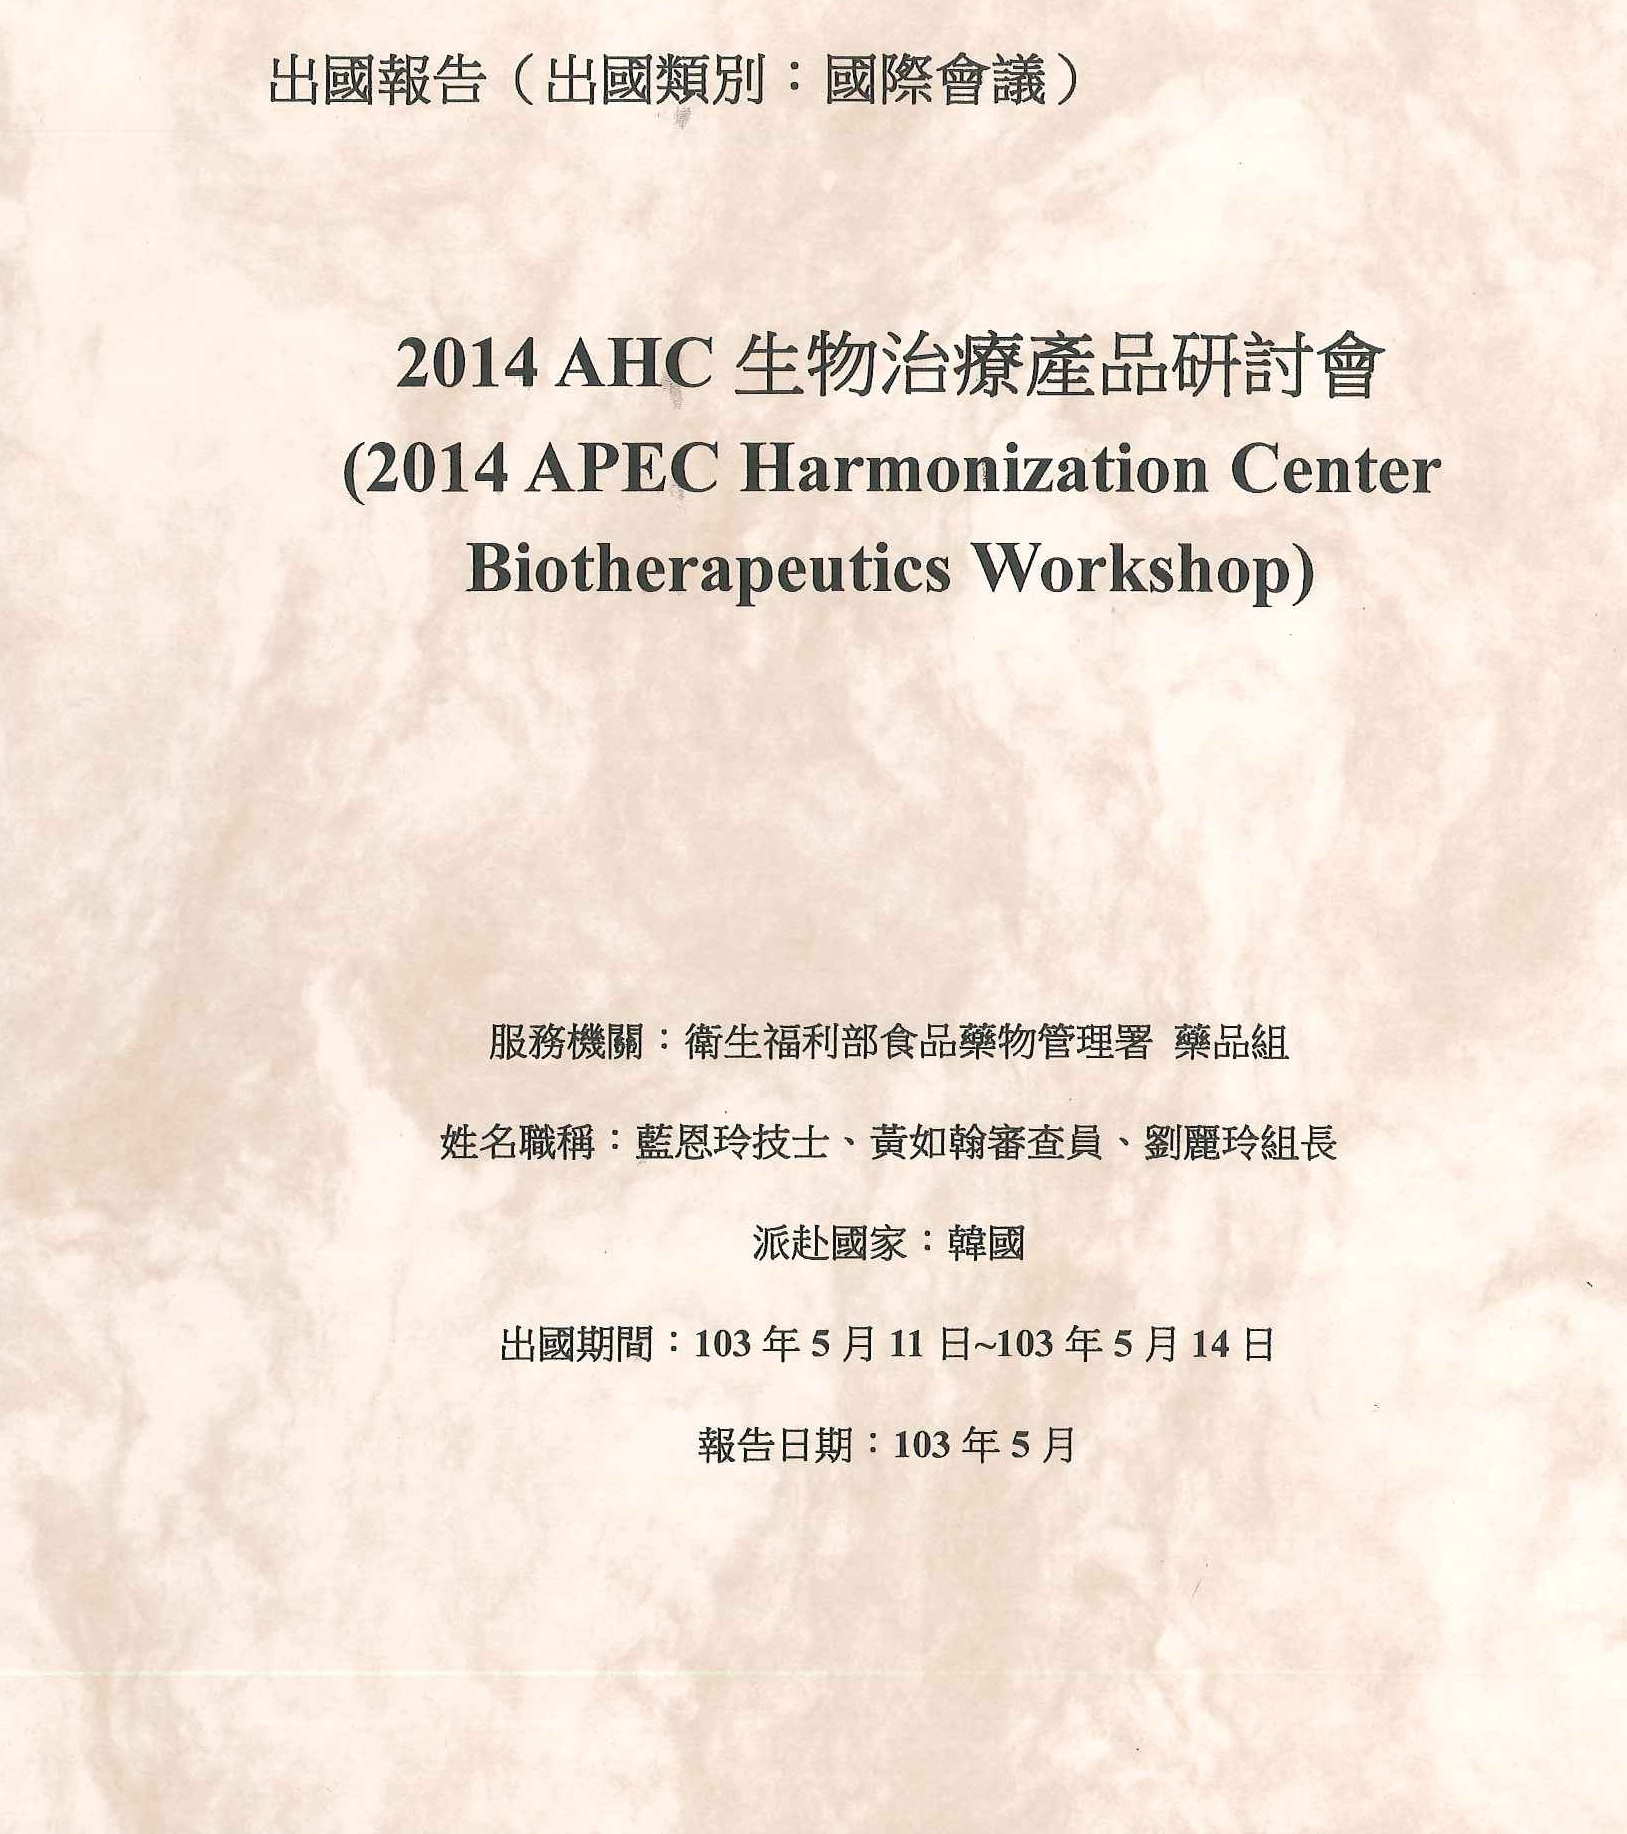 2014 AHC生物治療產品研討會=2014 APEC harmonization center biotherapeutics workshop